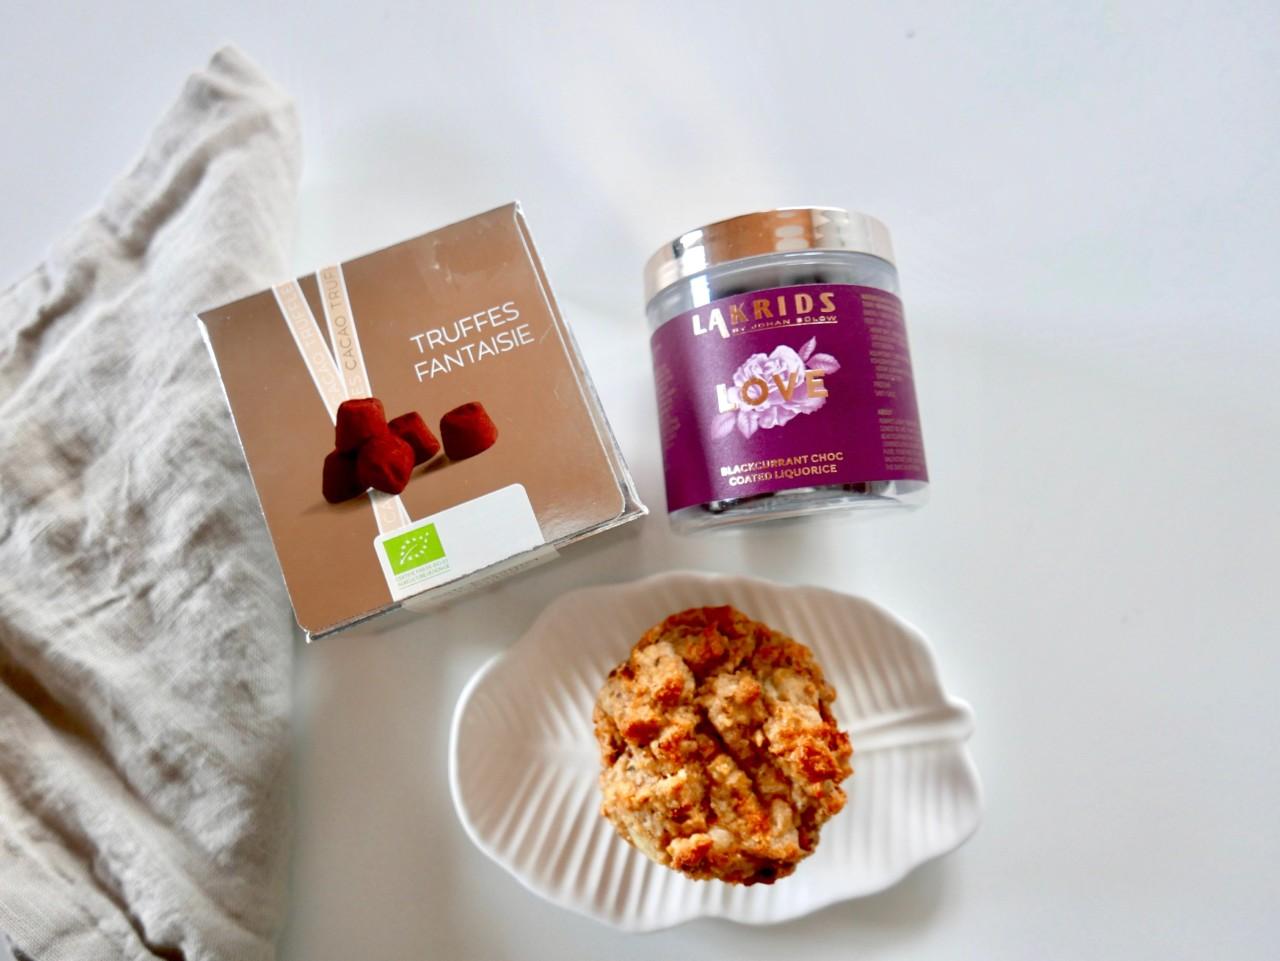 farsdag-mat-muffins-truffes-lakris